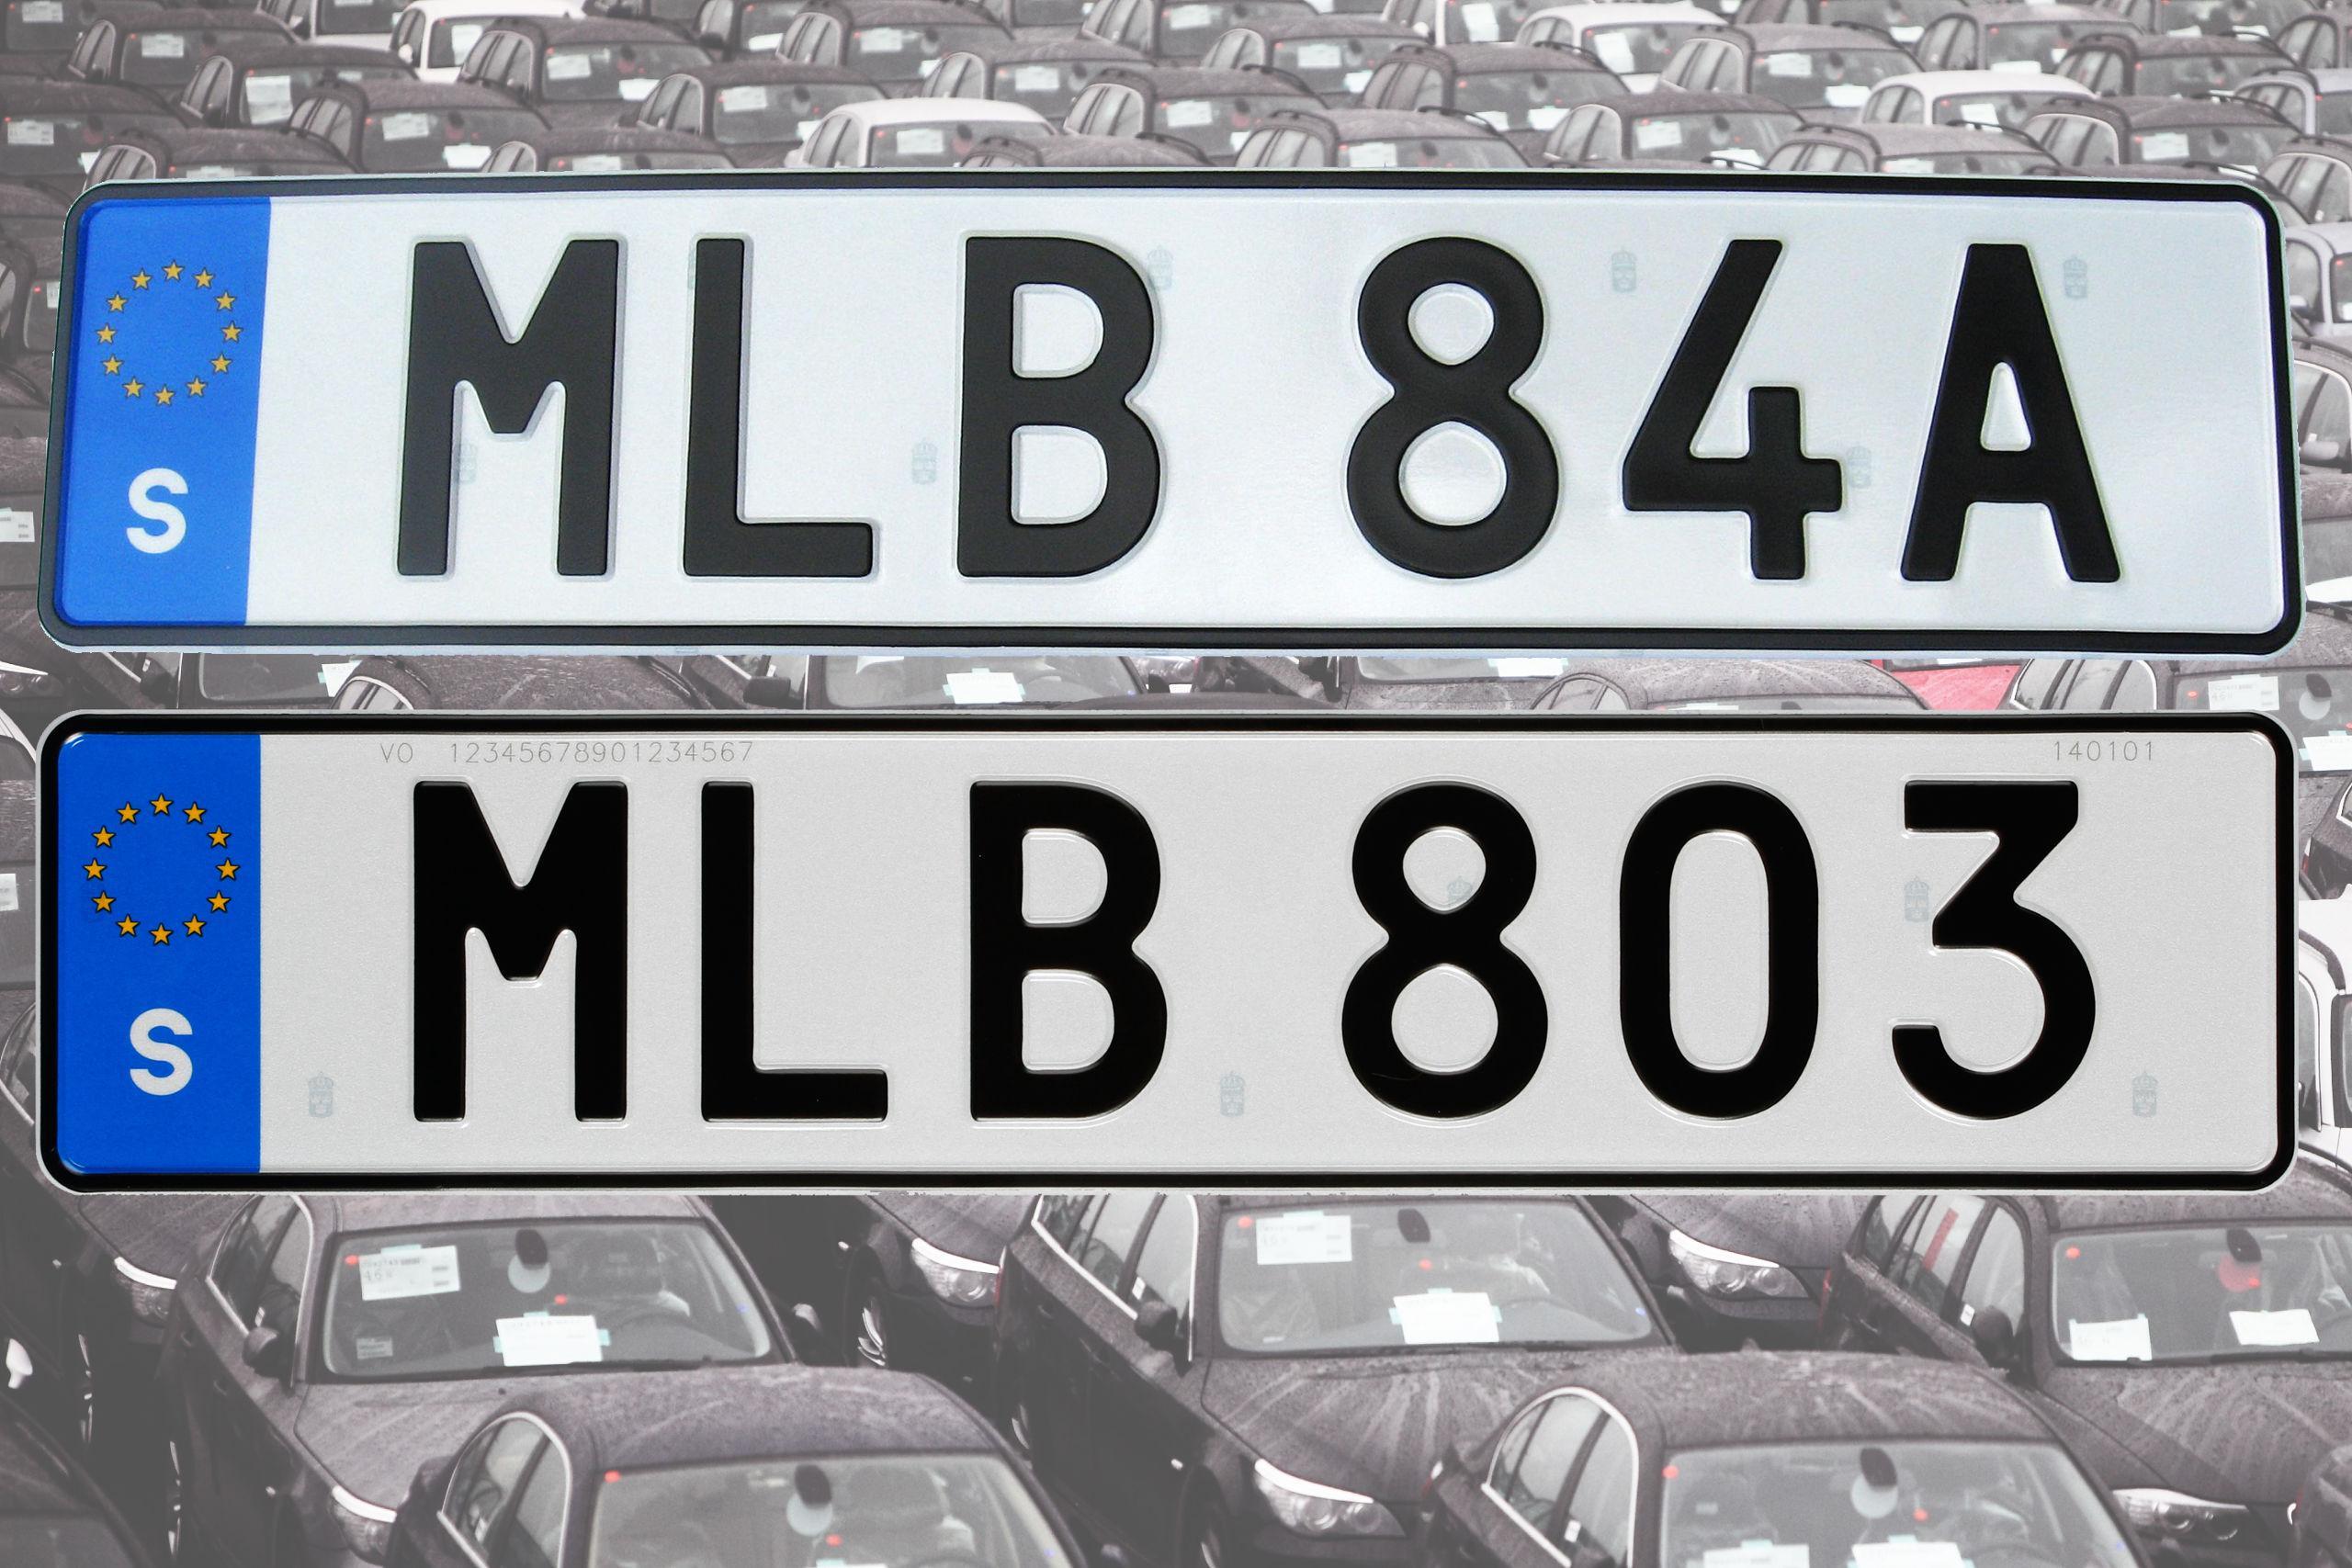 Soon we will get new license plates   Gothenburg Post